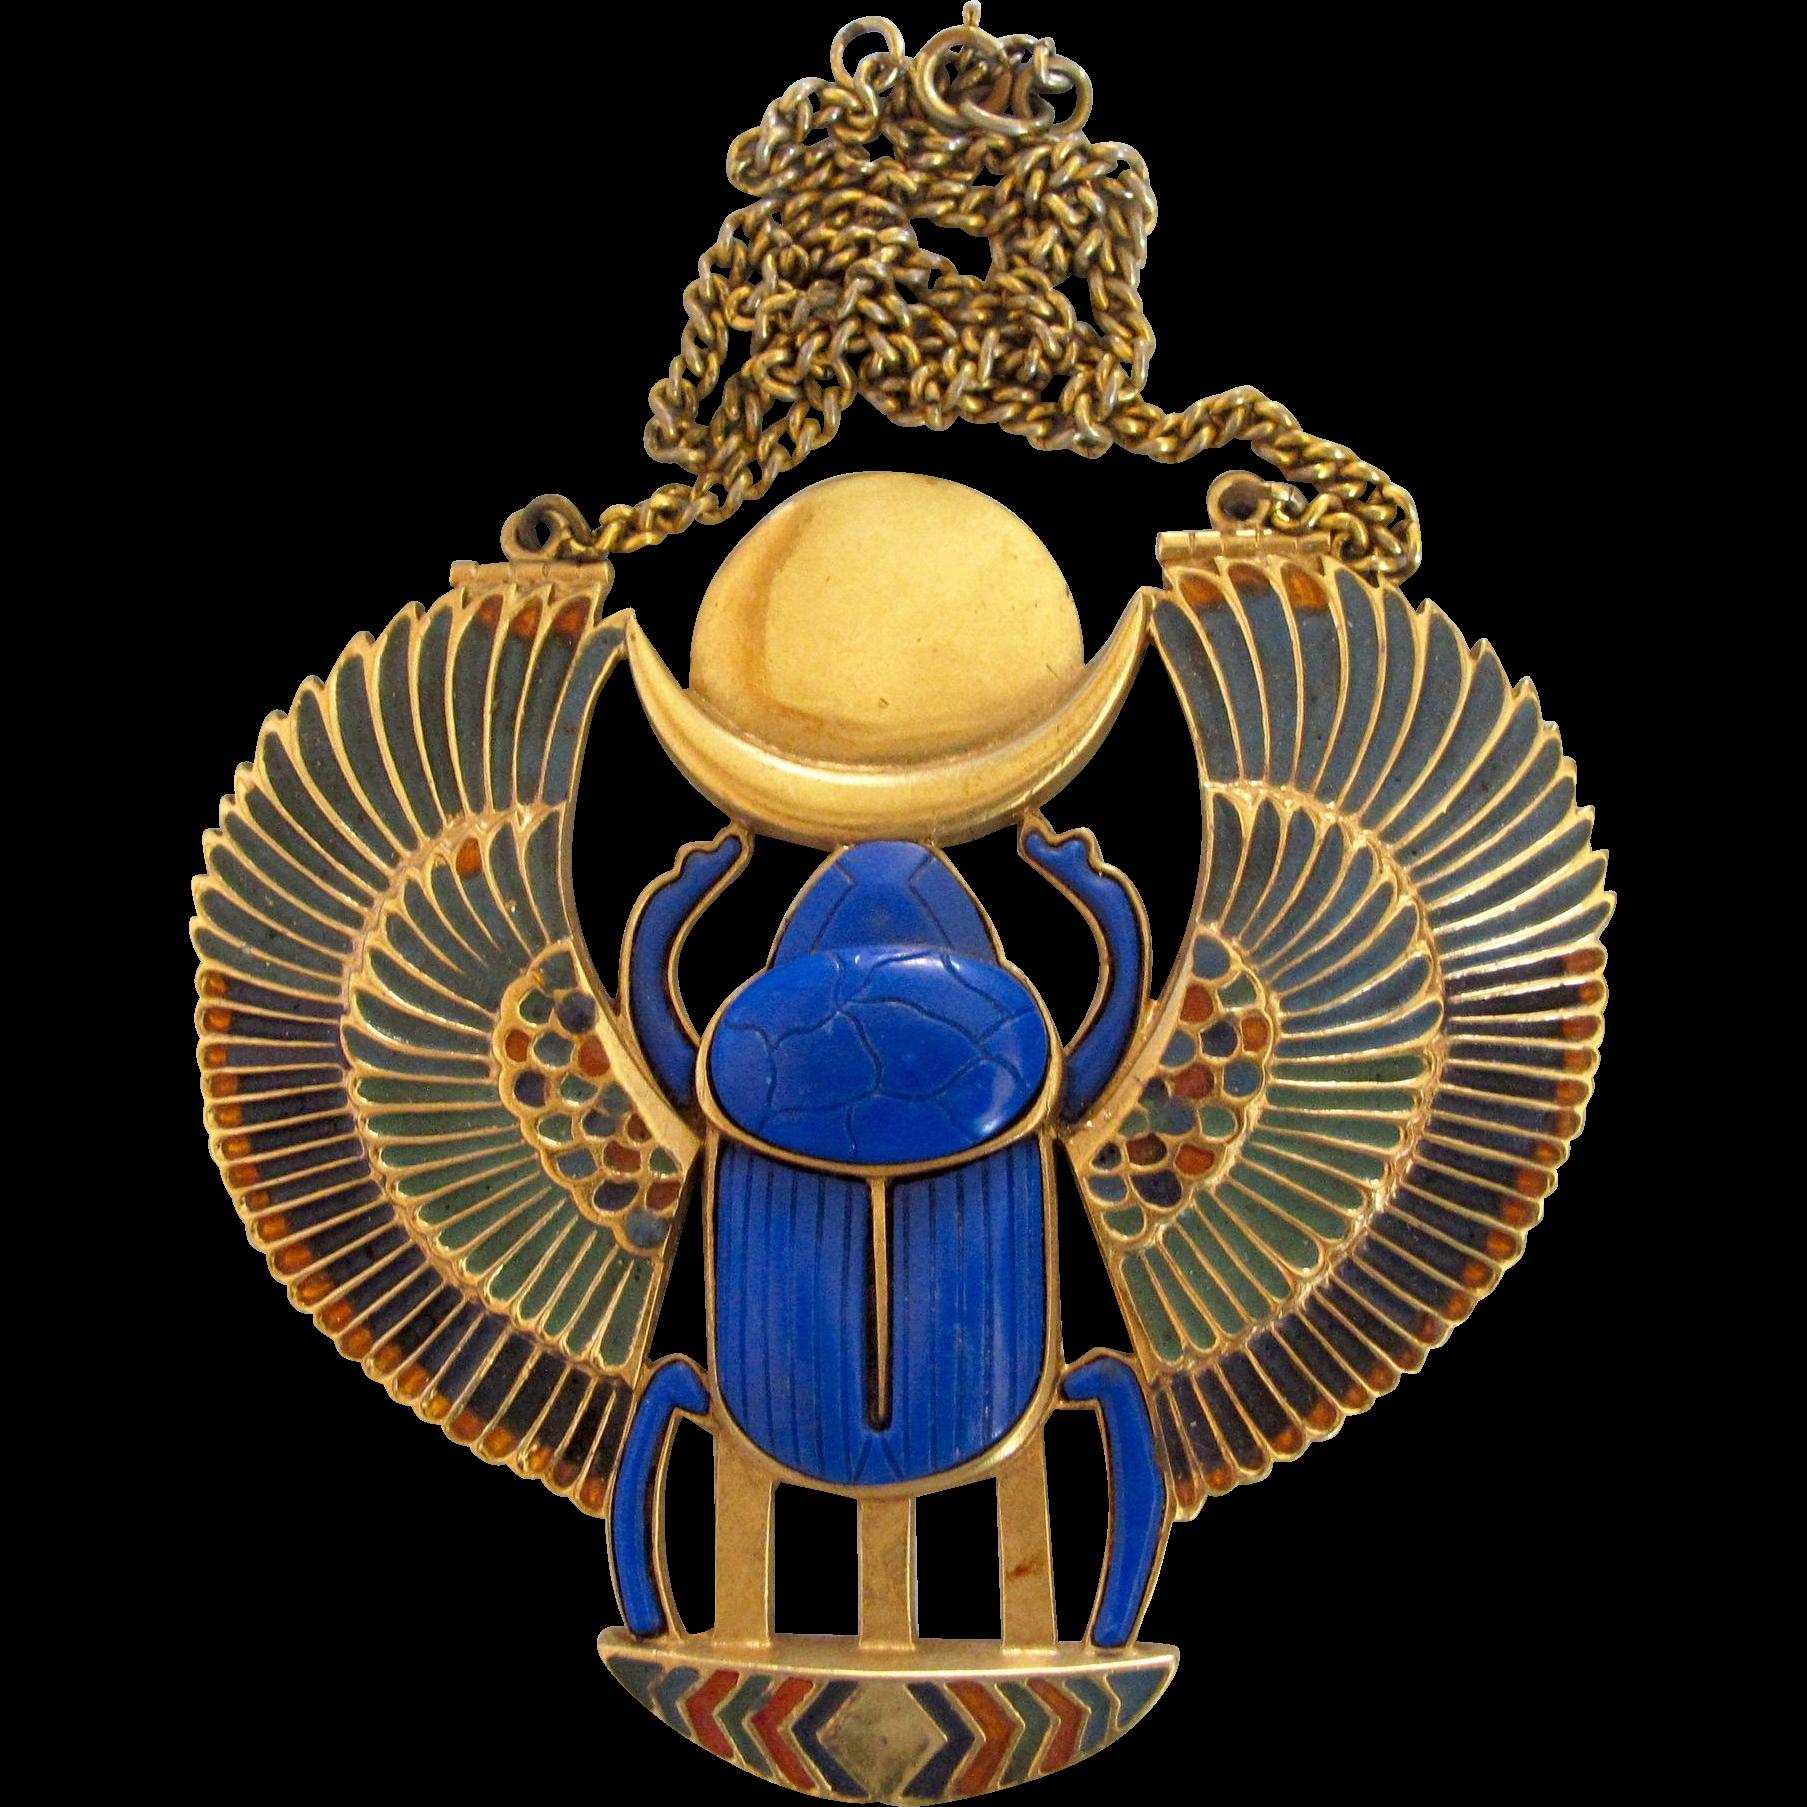 Vintage thomas fattorini rare huge egyptian revival scarab pendant vintage thomas fattorini rare huge egyptian revival scarab pendant 2hearts jewelry accessories ruby lane aloadofball Choice Image